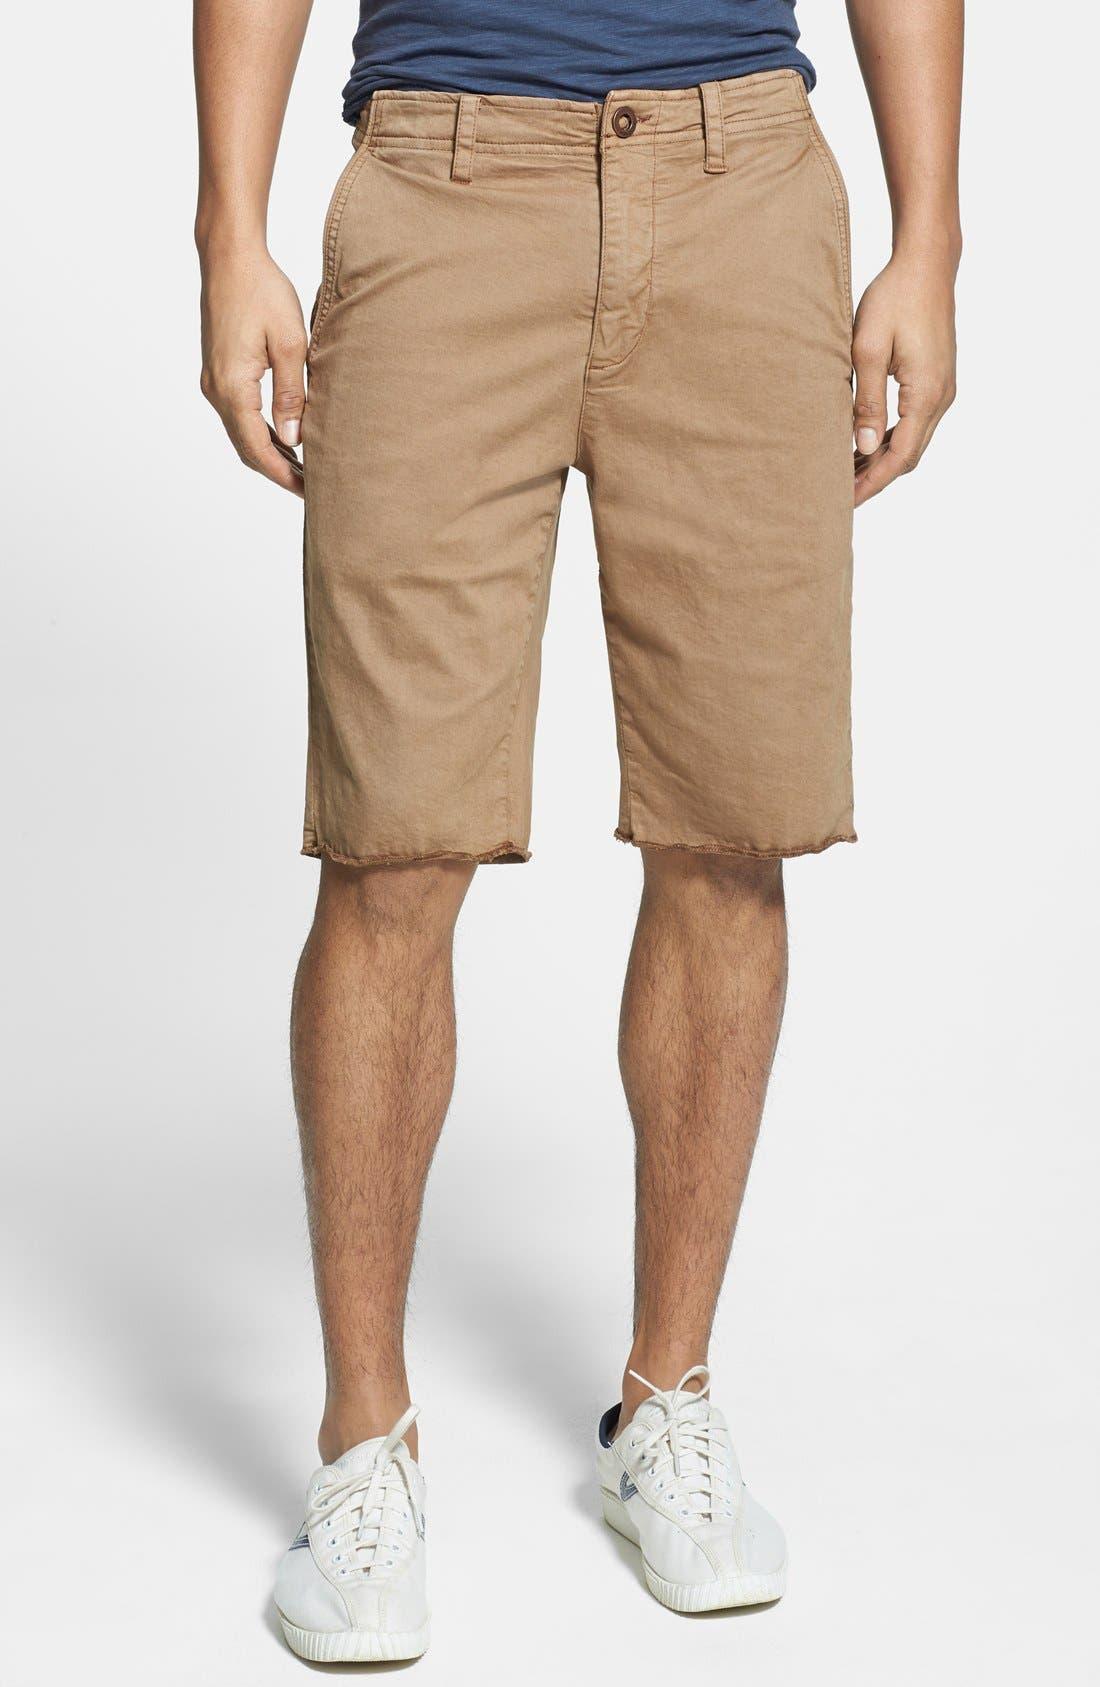 VOLCOM 'Stonewater' Shorts, Main, color, 258